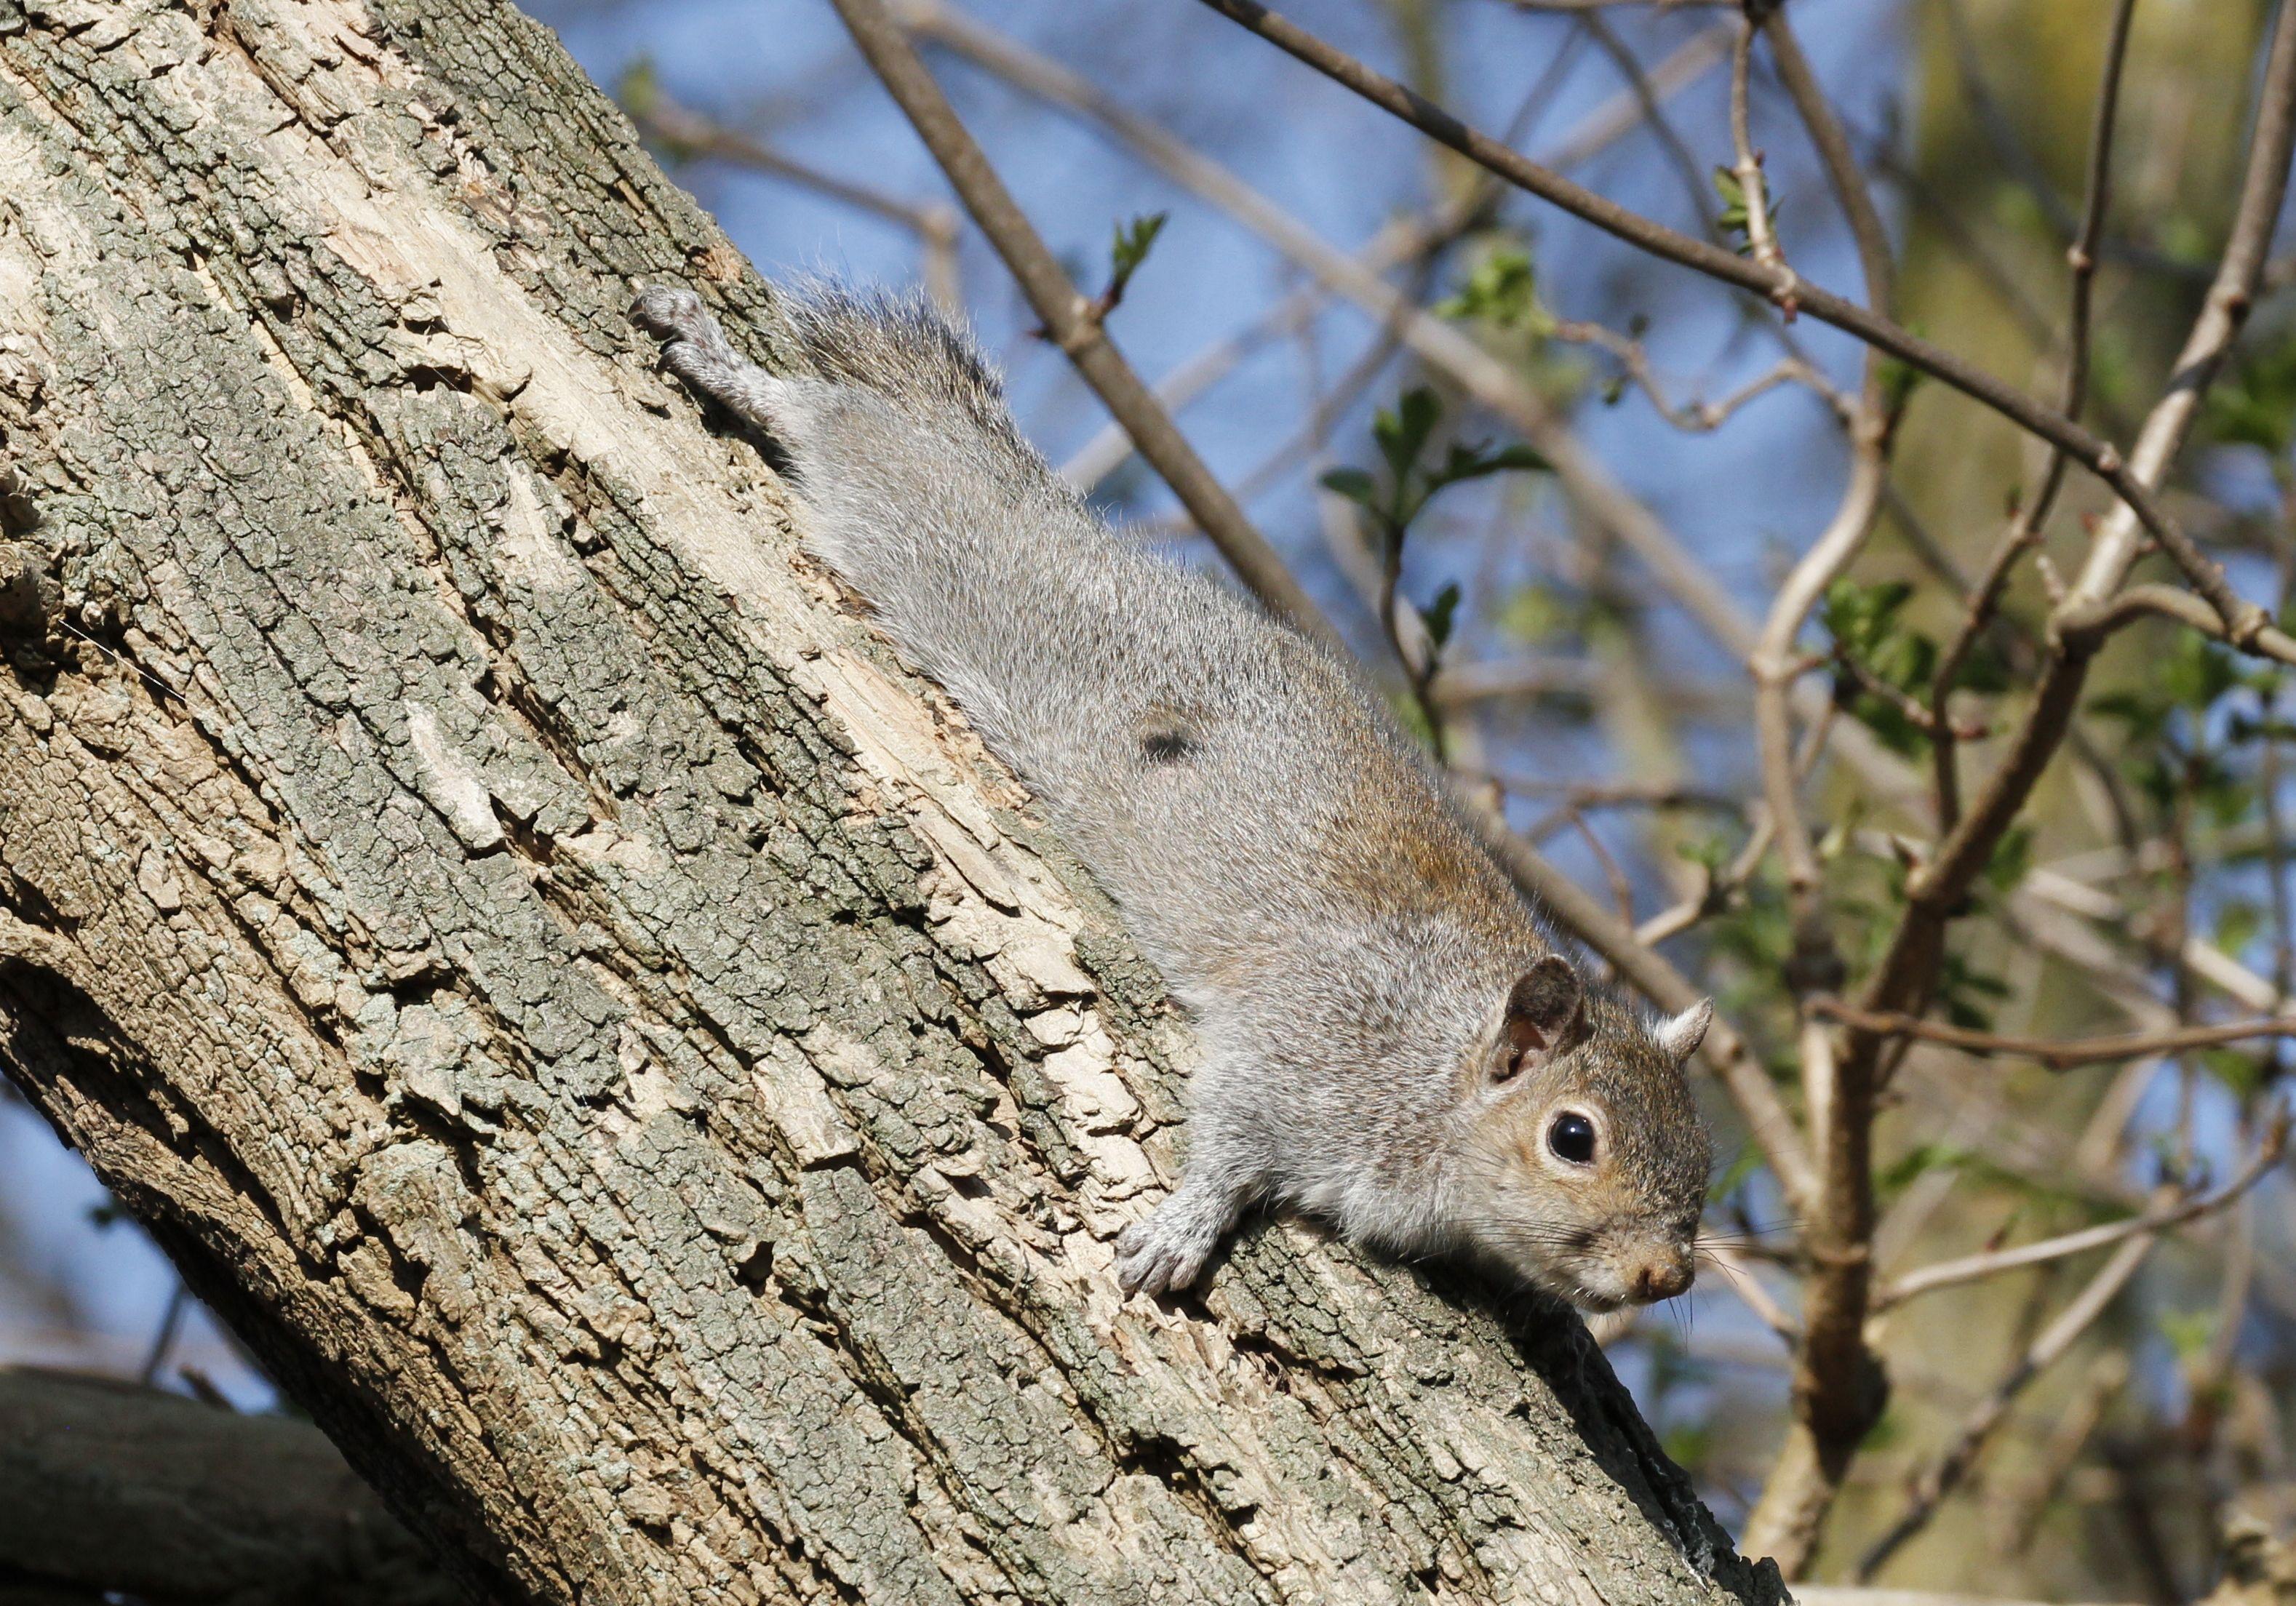 Grey squirrel_copyright_Tim M Blackburn